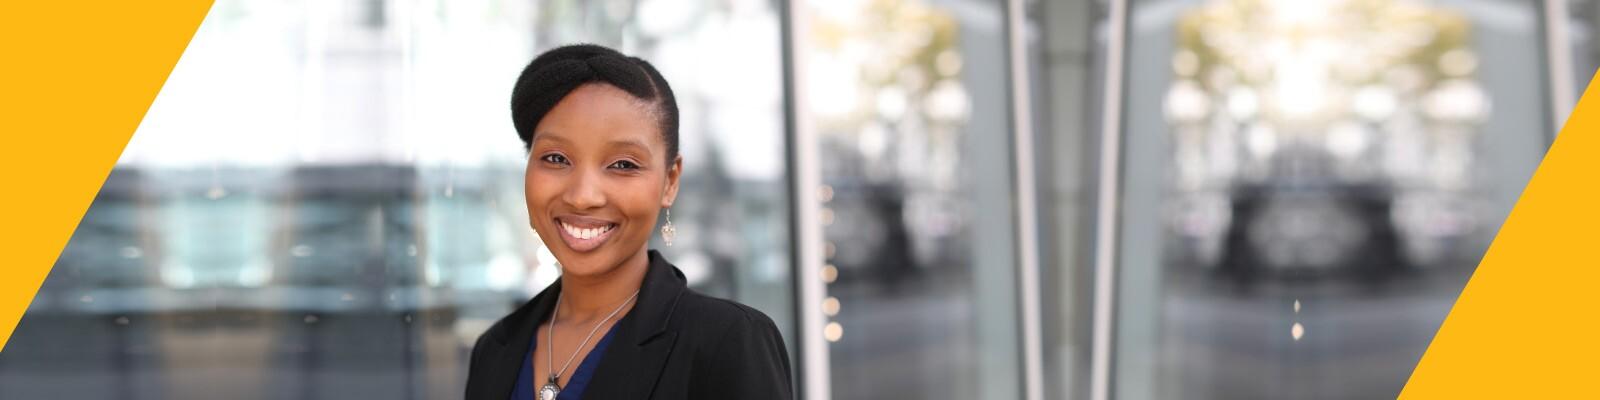 Woman in black business jacket